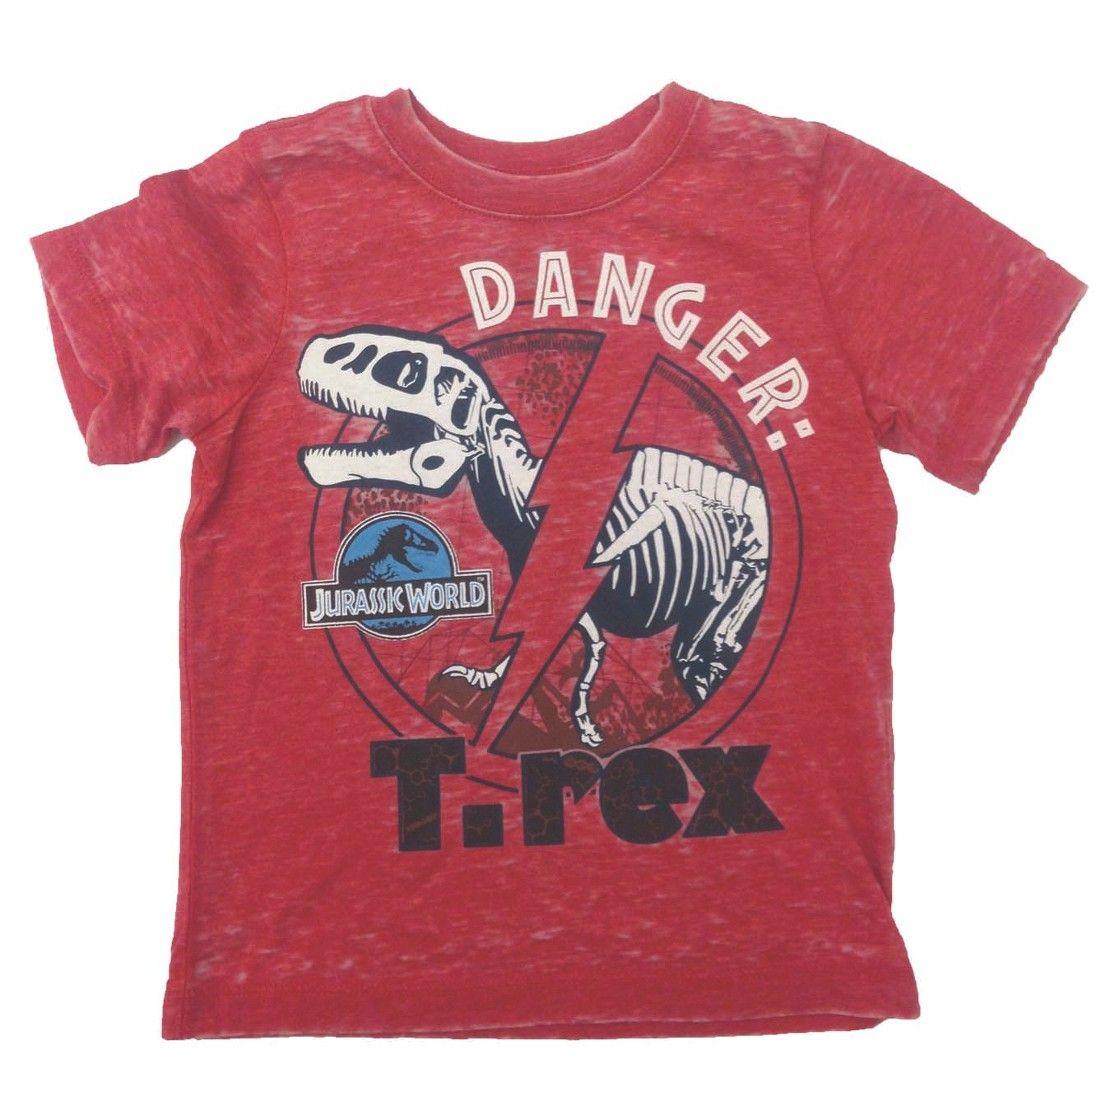 Jurassic World Toddler Boys' T-Rex Tee - Apple Red